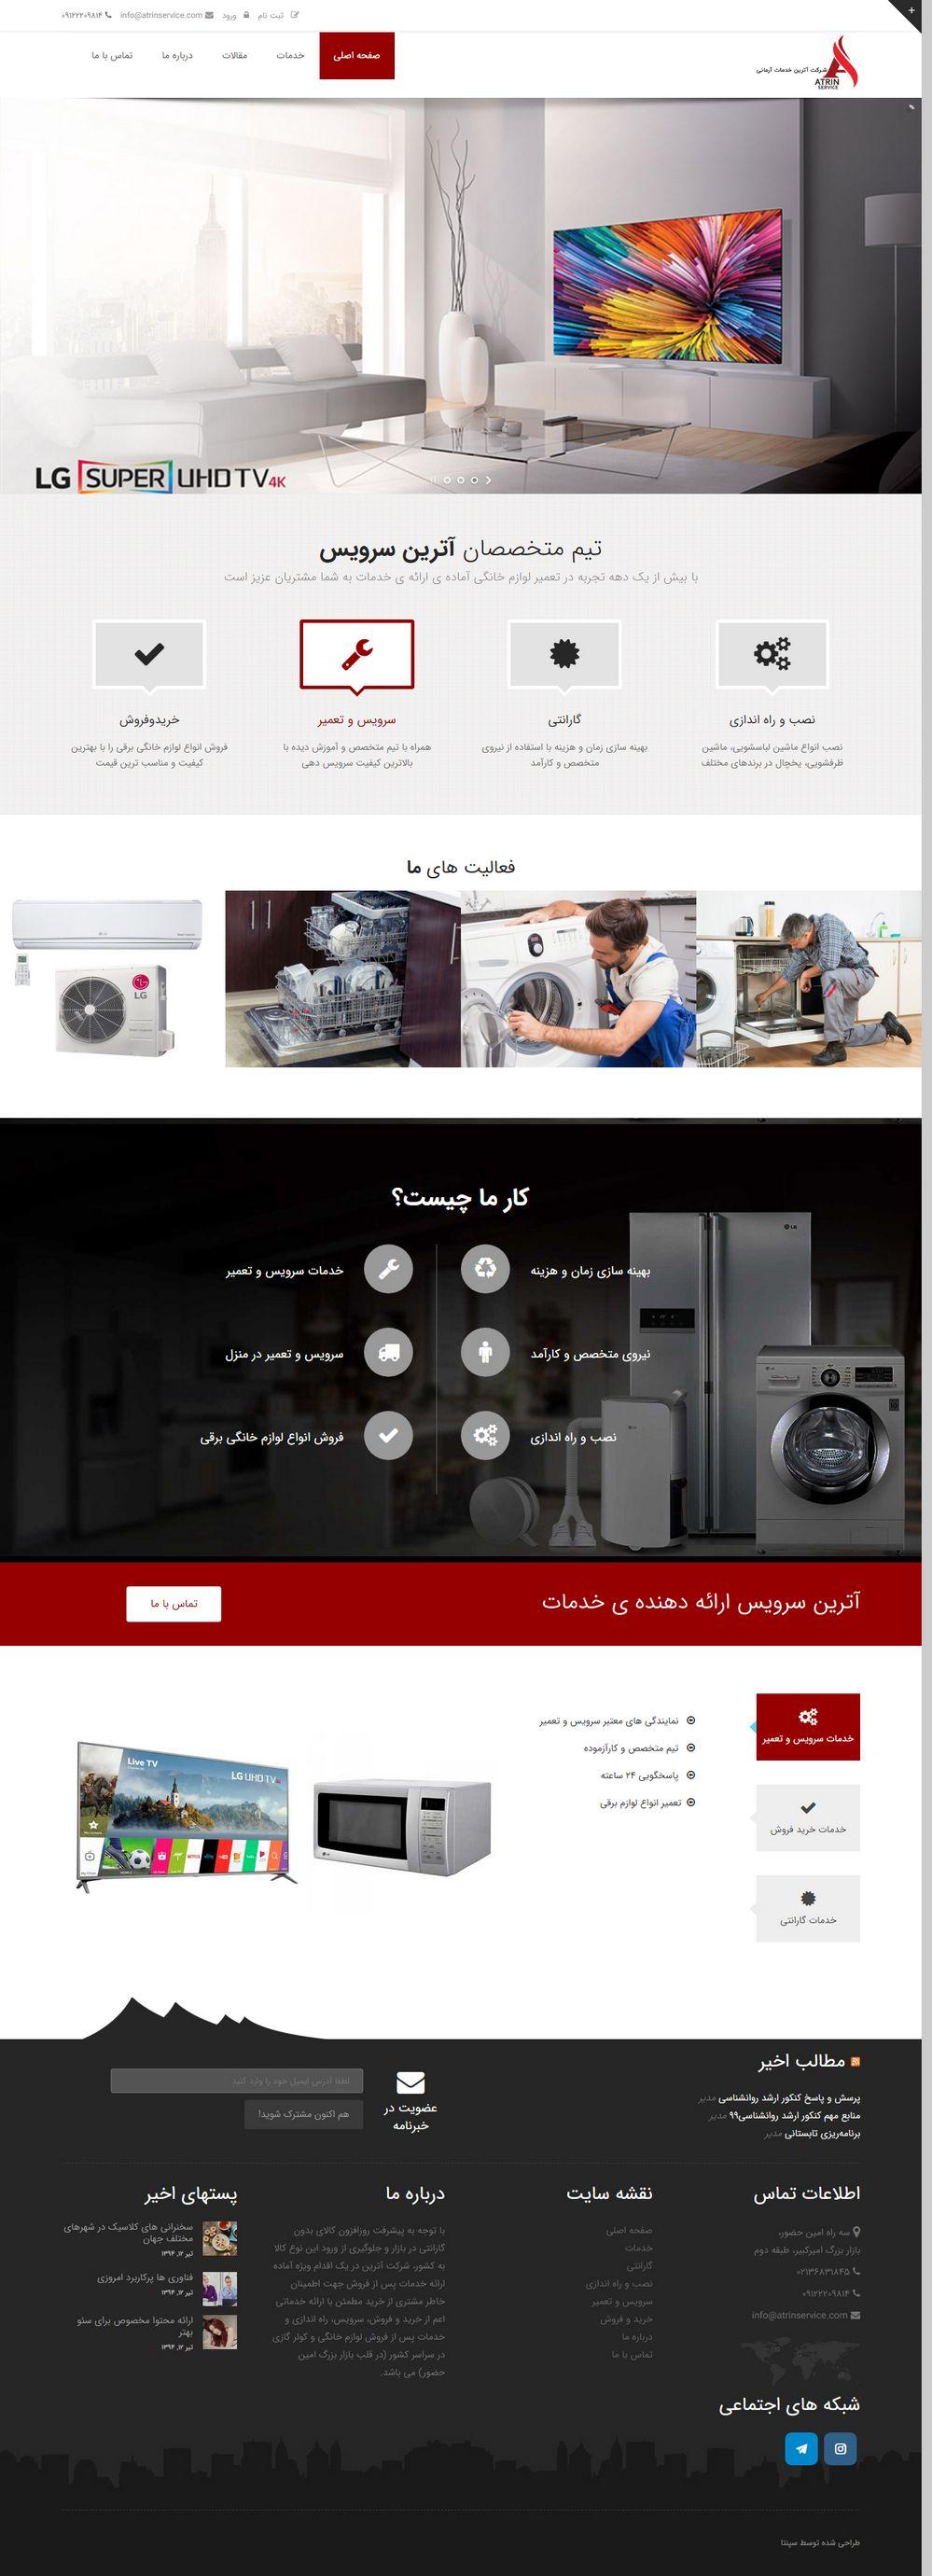 طراحی سایت شرکت آترین سرویس